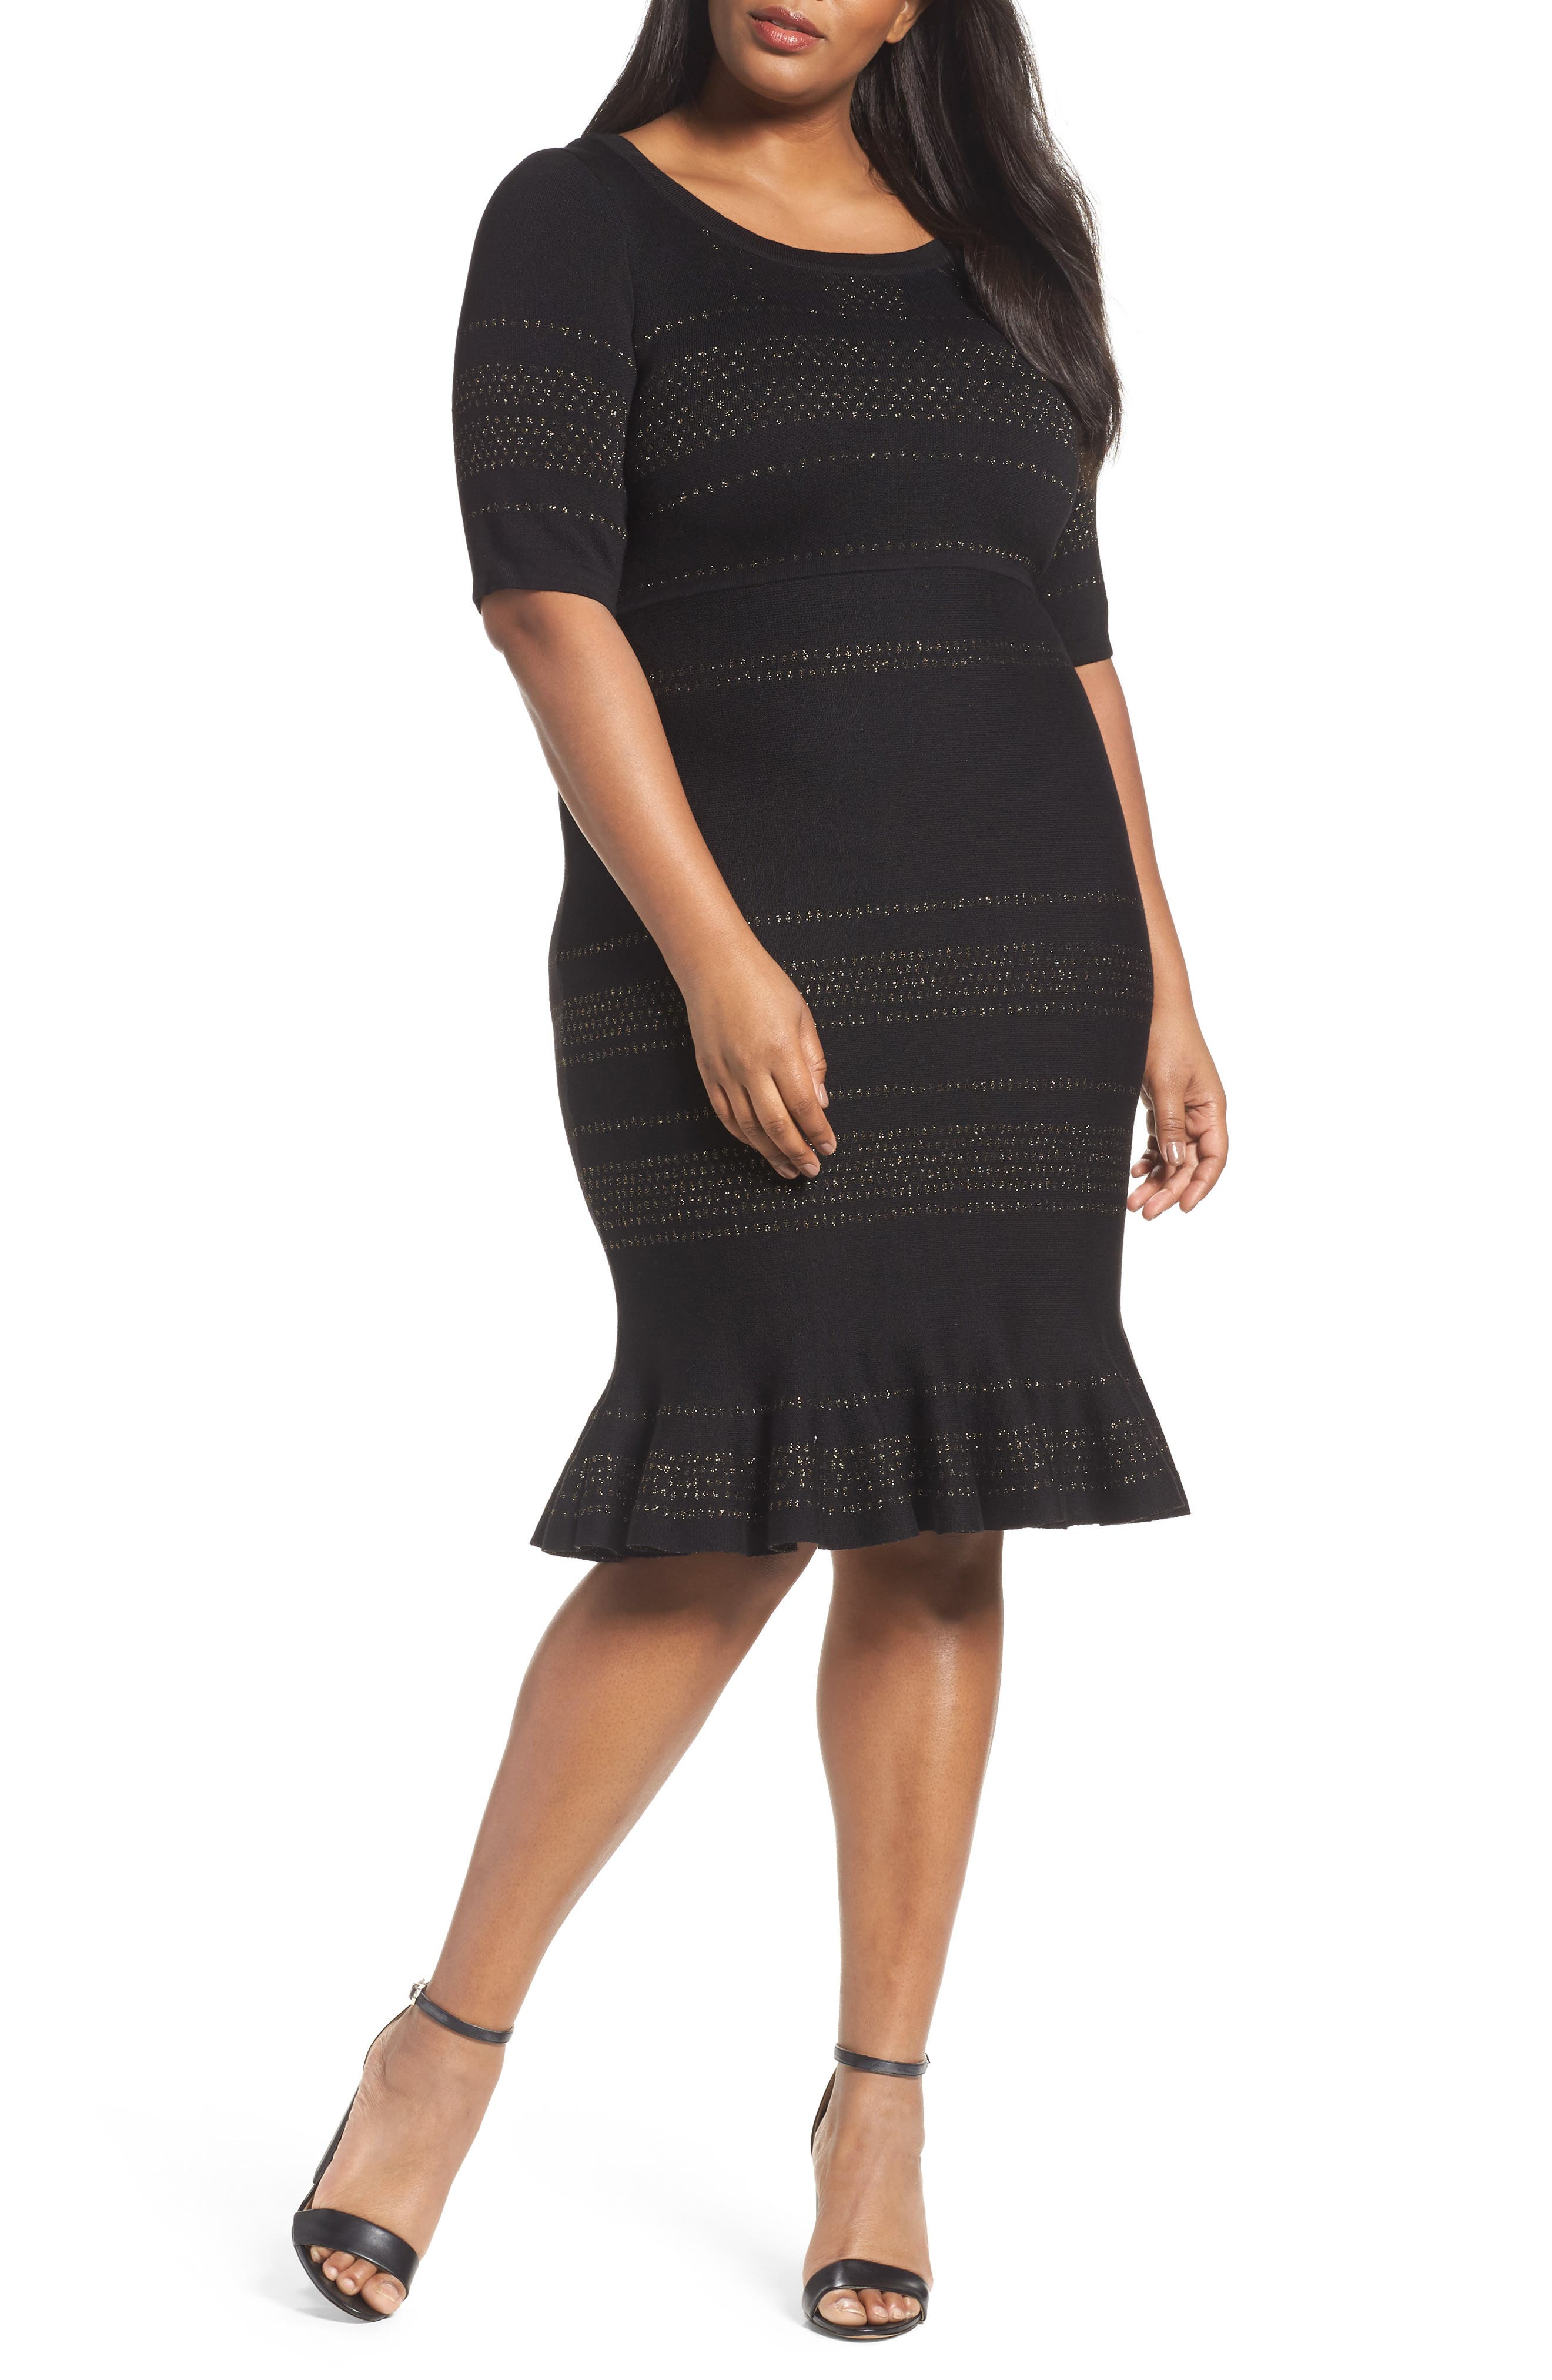 Main Image - Taylor Dresses Metallic Knit Dress (Plus Size)